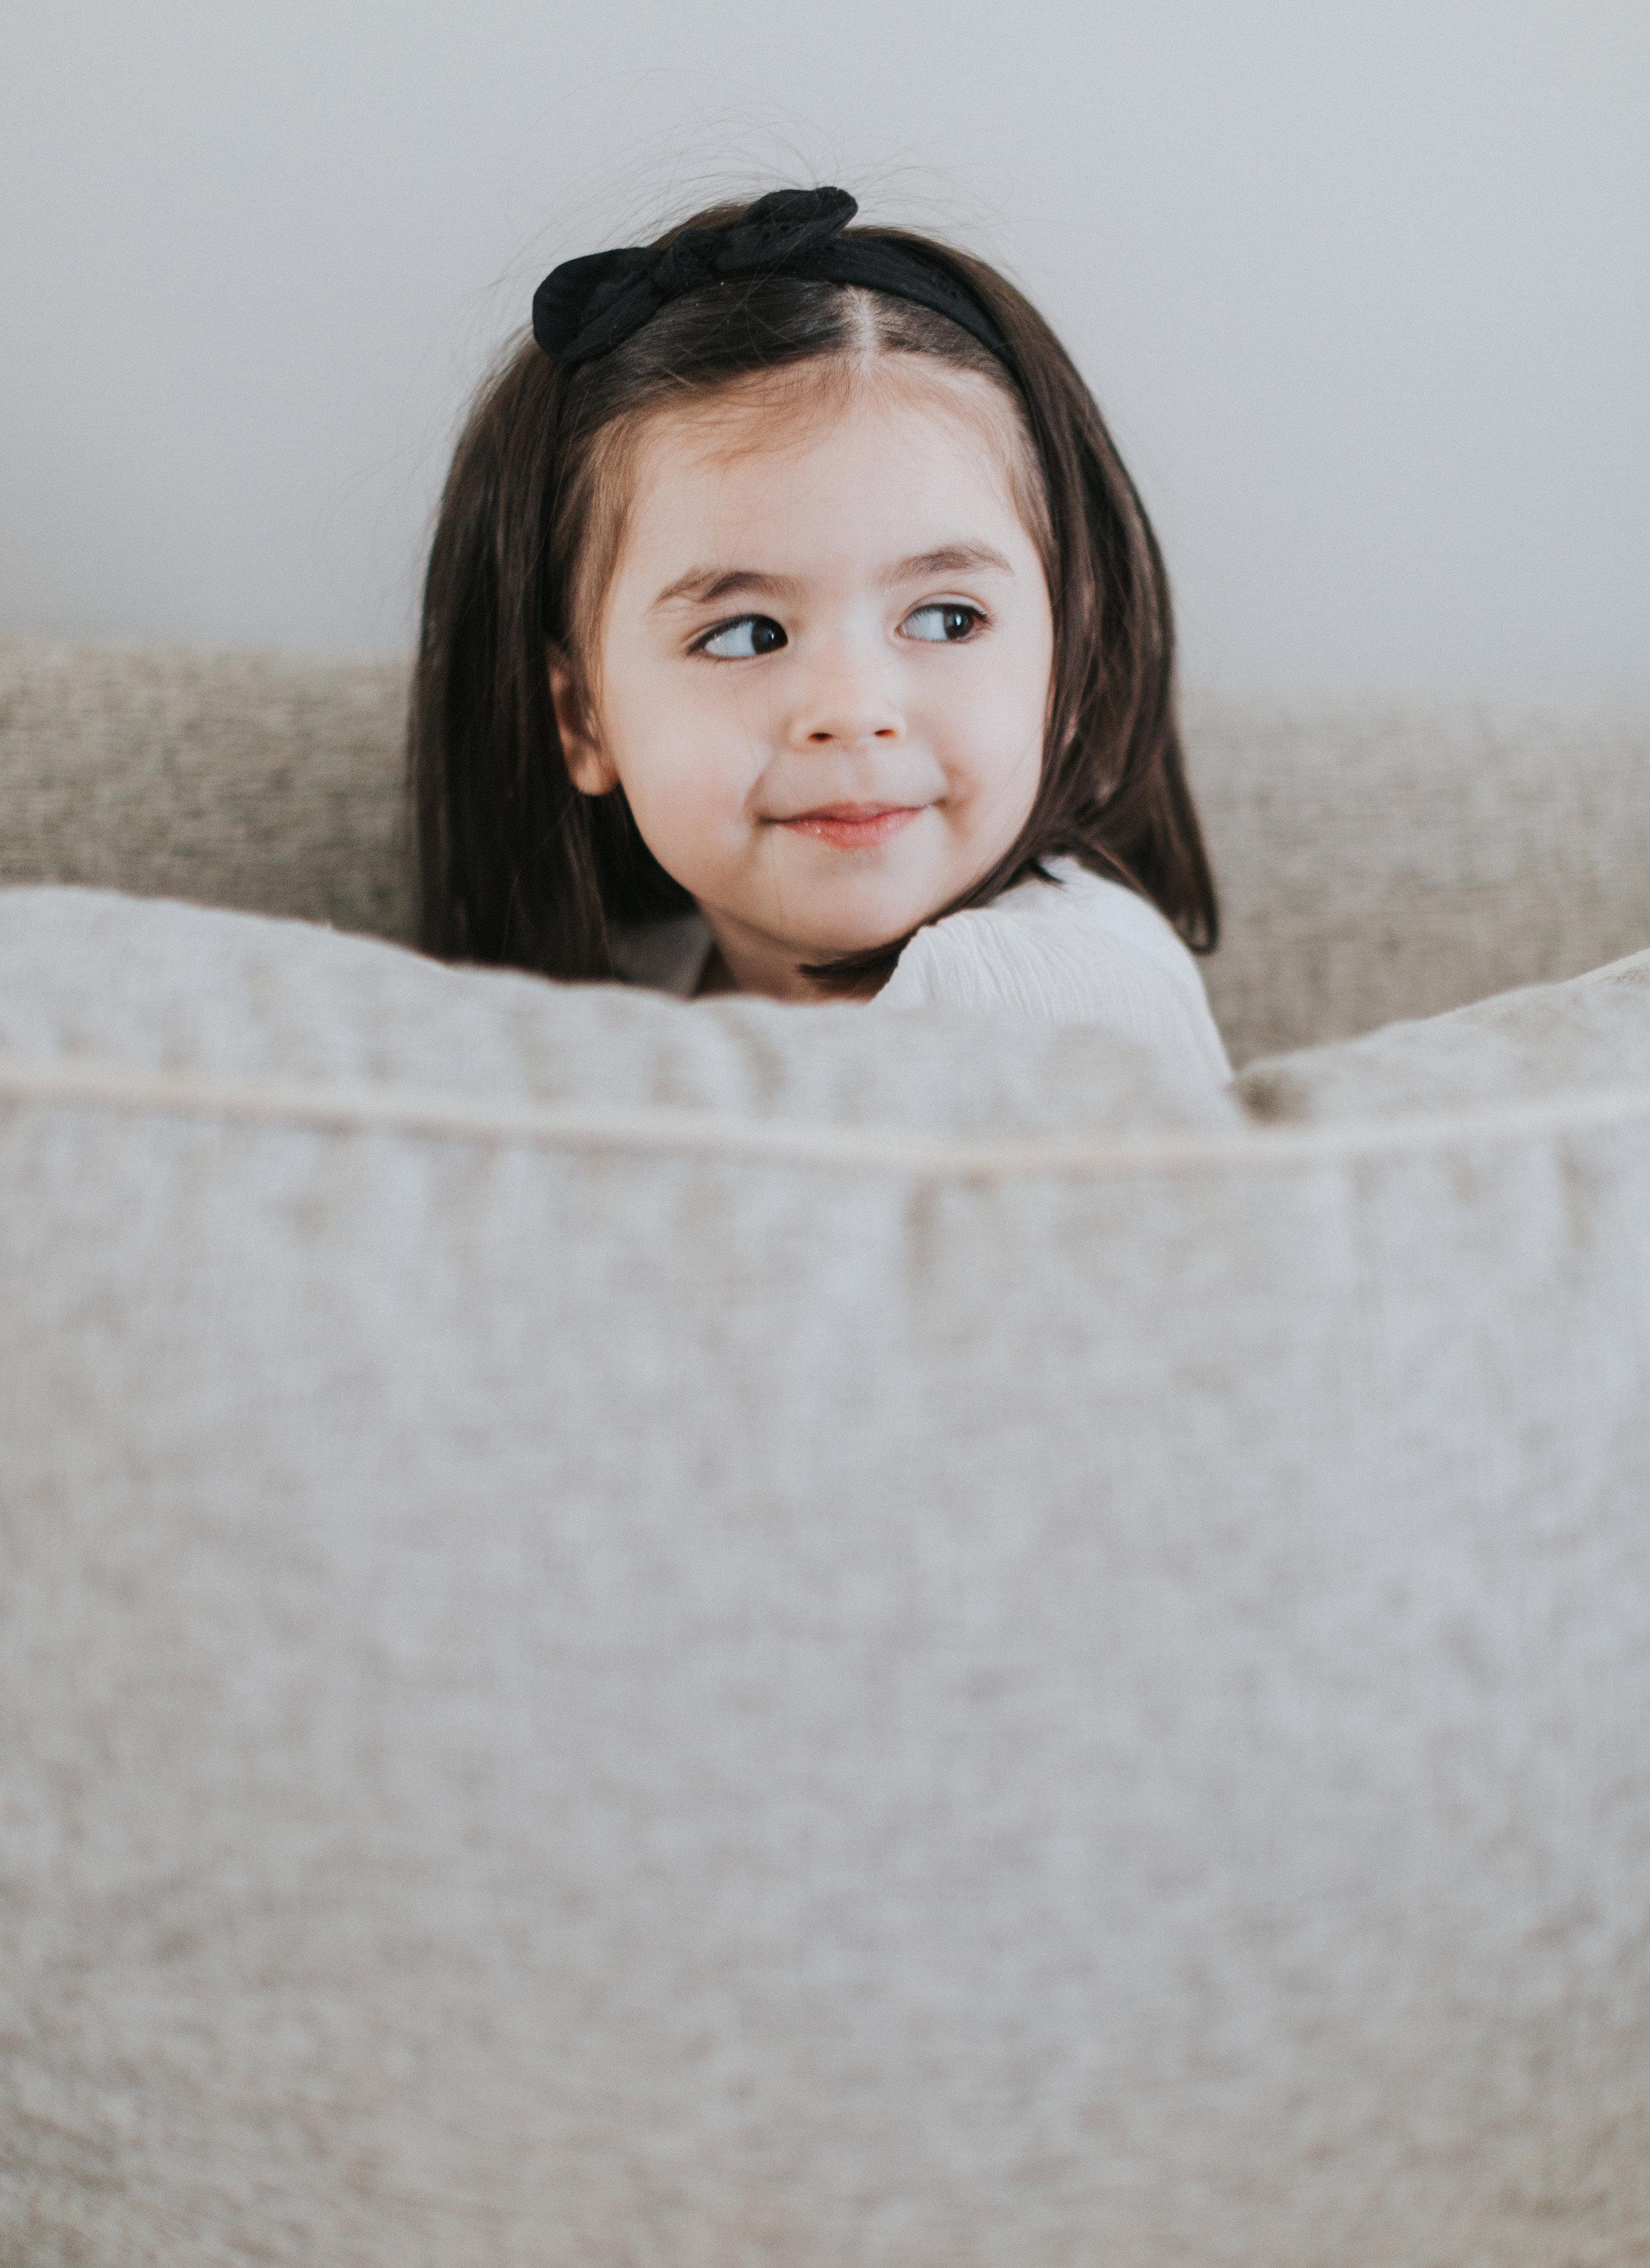 lifestyle-newborn-photographer-nashville-franlin-brentwood-adoption-25.jpg